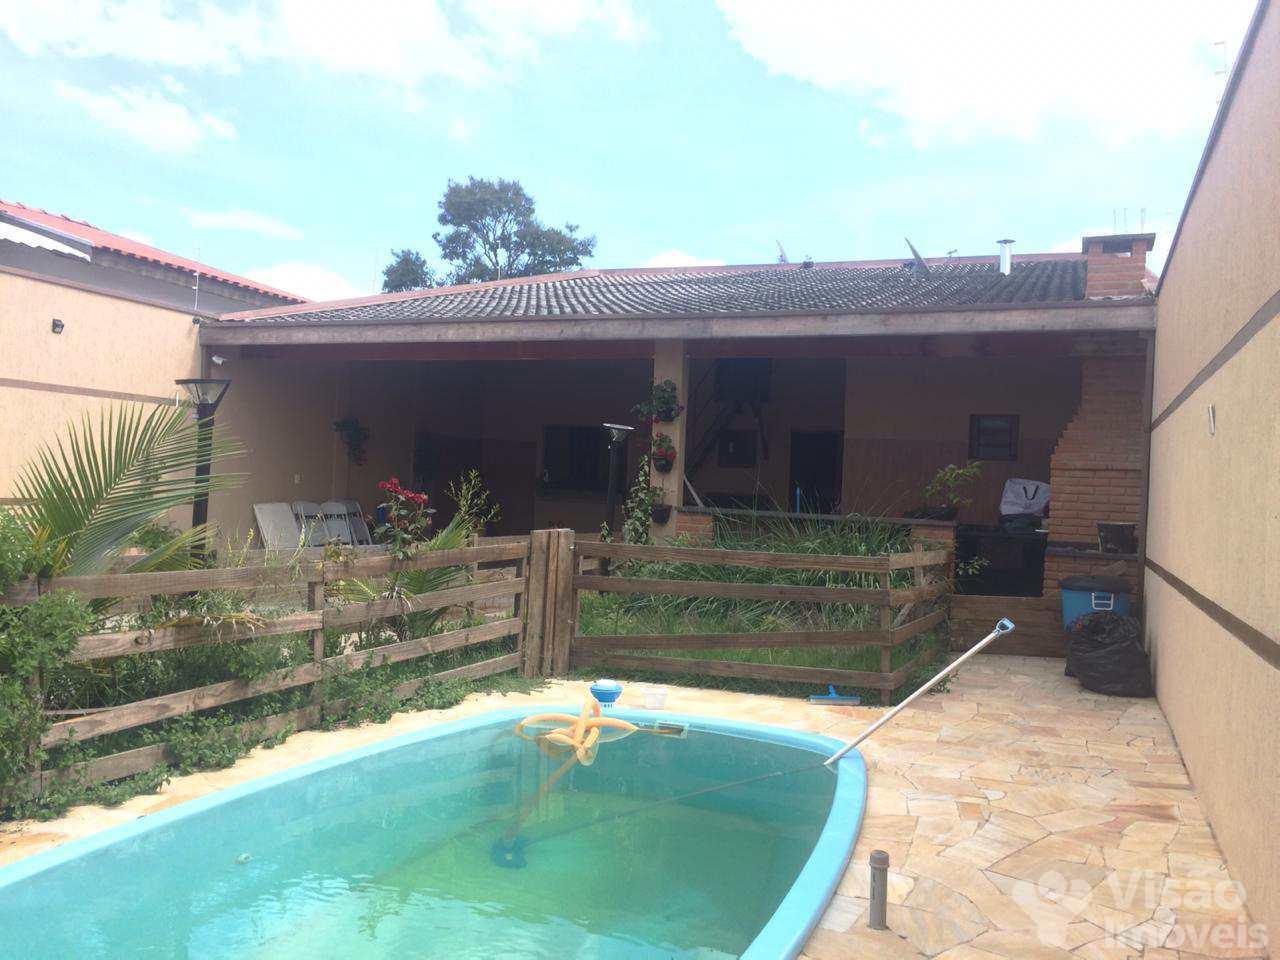 Casa com 2 dorms, Flor do Vale, Tremembé - R$ 320 mil, Cod: 1920033